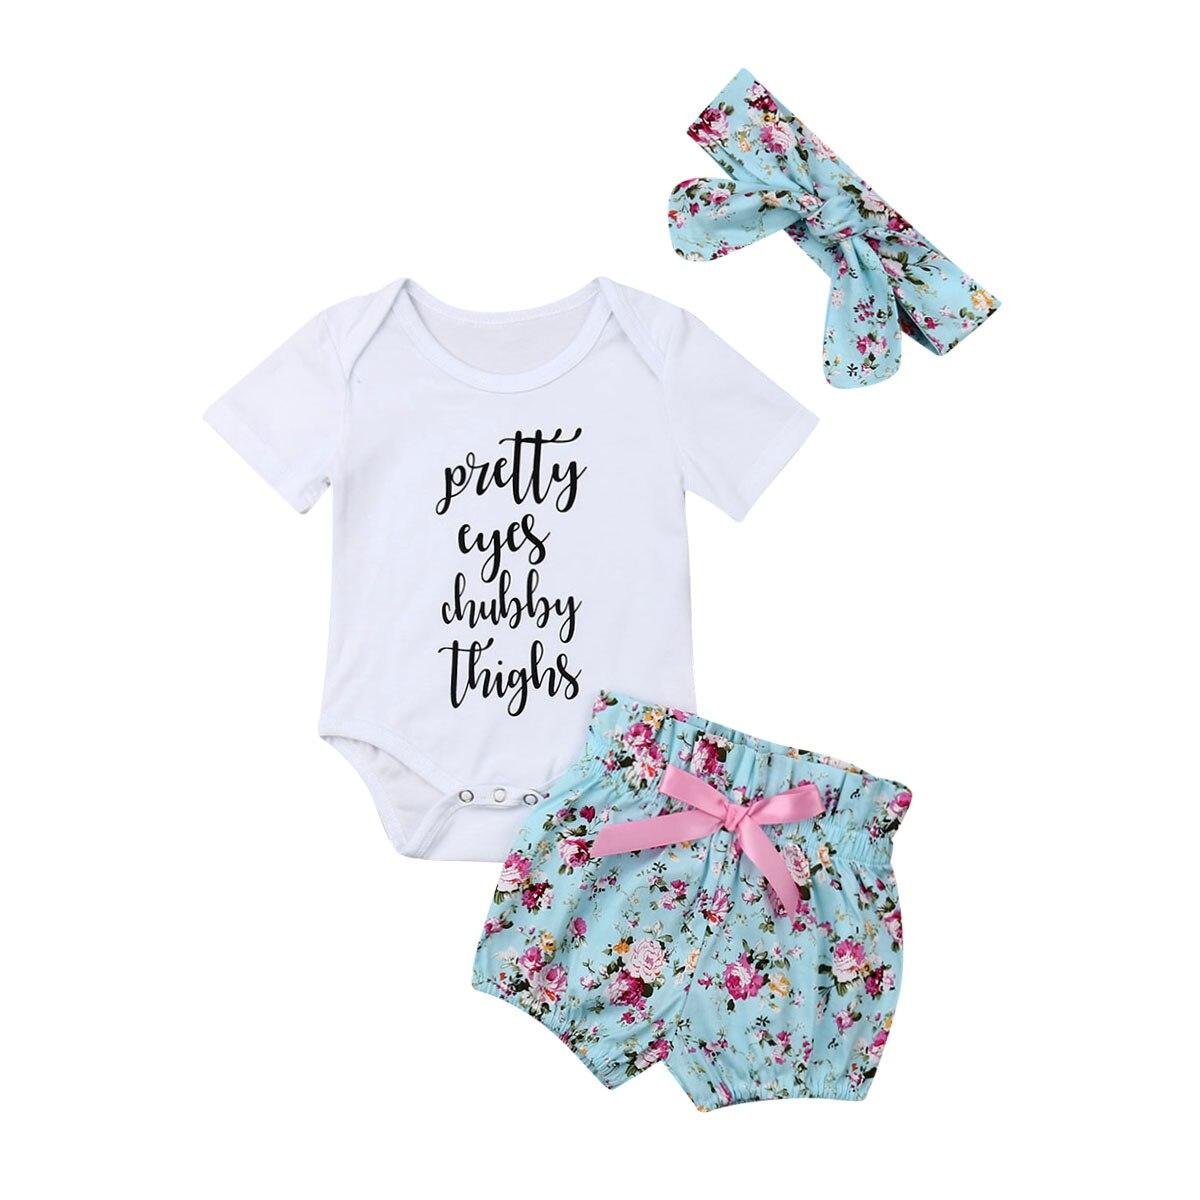 0-18 M Nette Neugeborene Baby Mädchen Kurzarm Baumwolle Body Tops Floral Bowknot Shorts Hose Stirnband 3 Pcs Baby Mädchen Kleidung Set